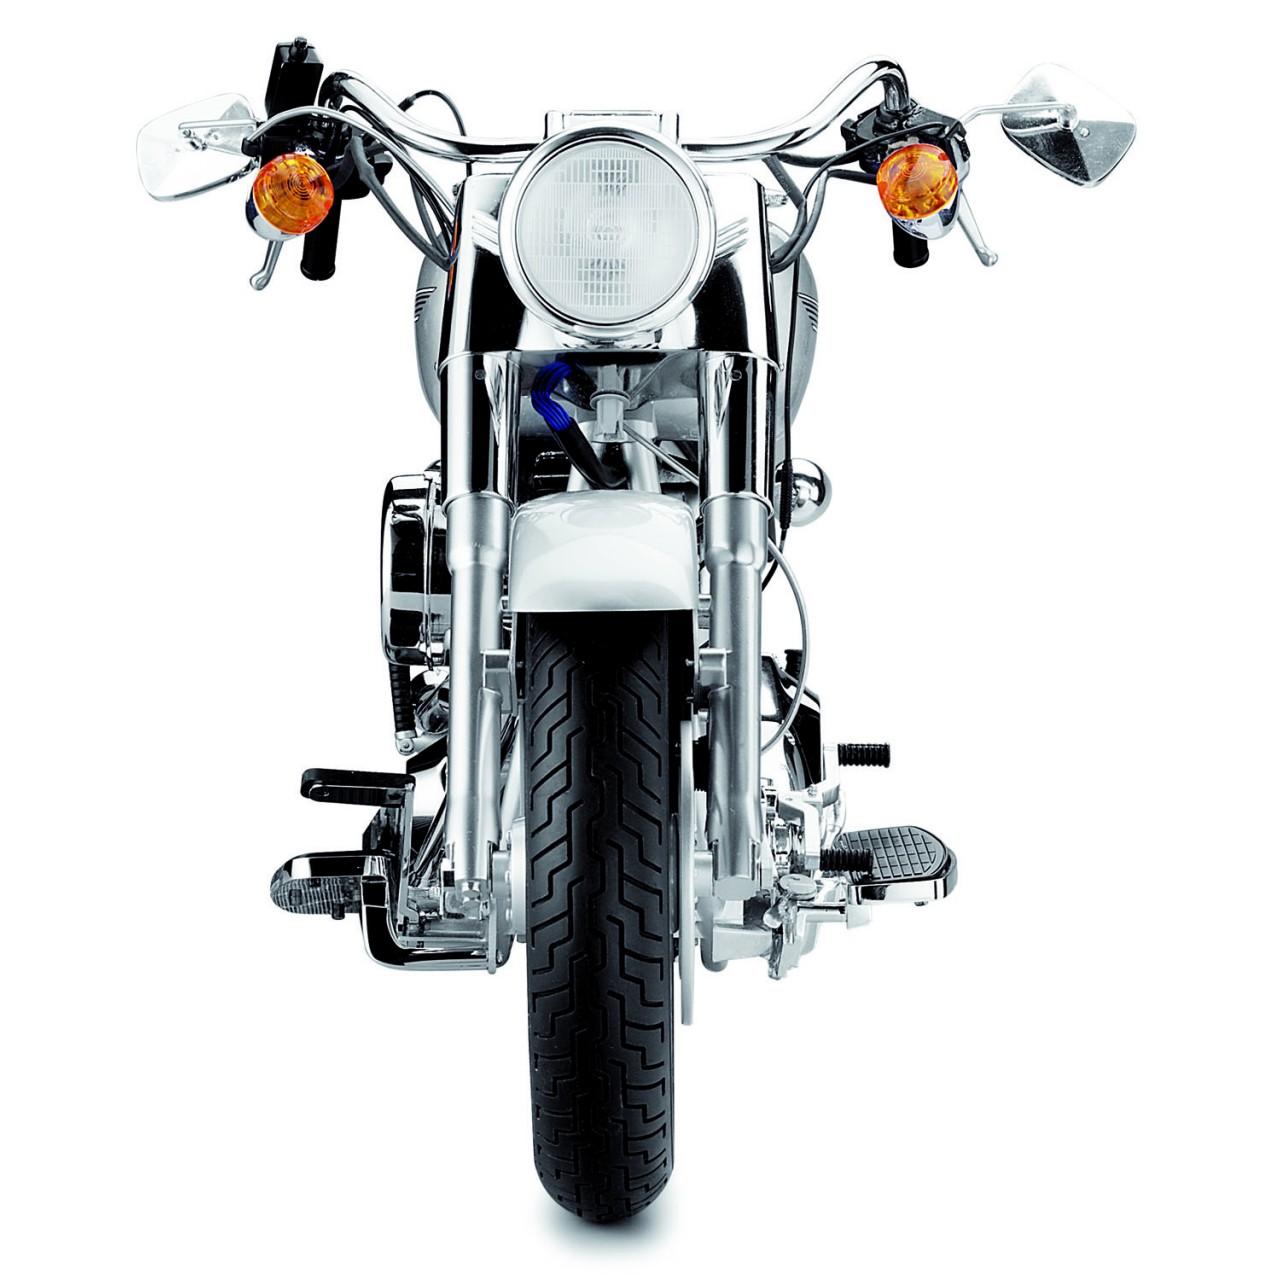 Harley Davidson Fat Boy 14 Model Bike Full Kit Modelspace Harleydavidson Motorcycles This Diagram Provides A Parts Detail For Scale Mode